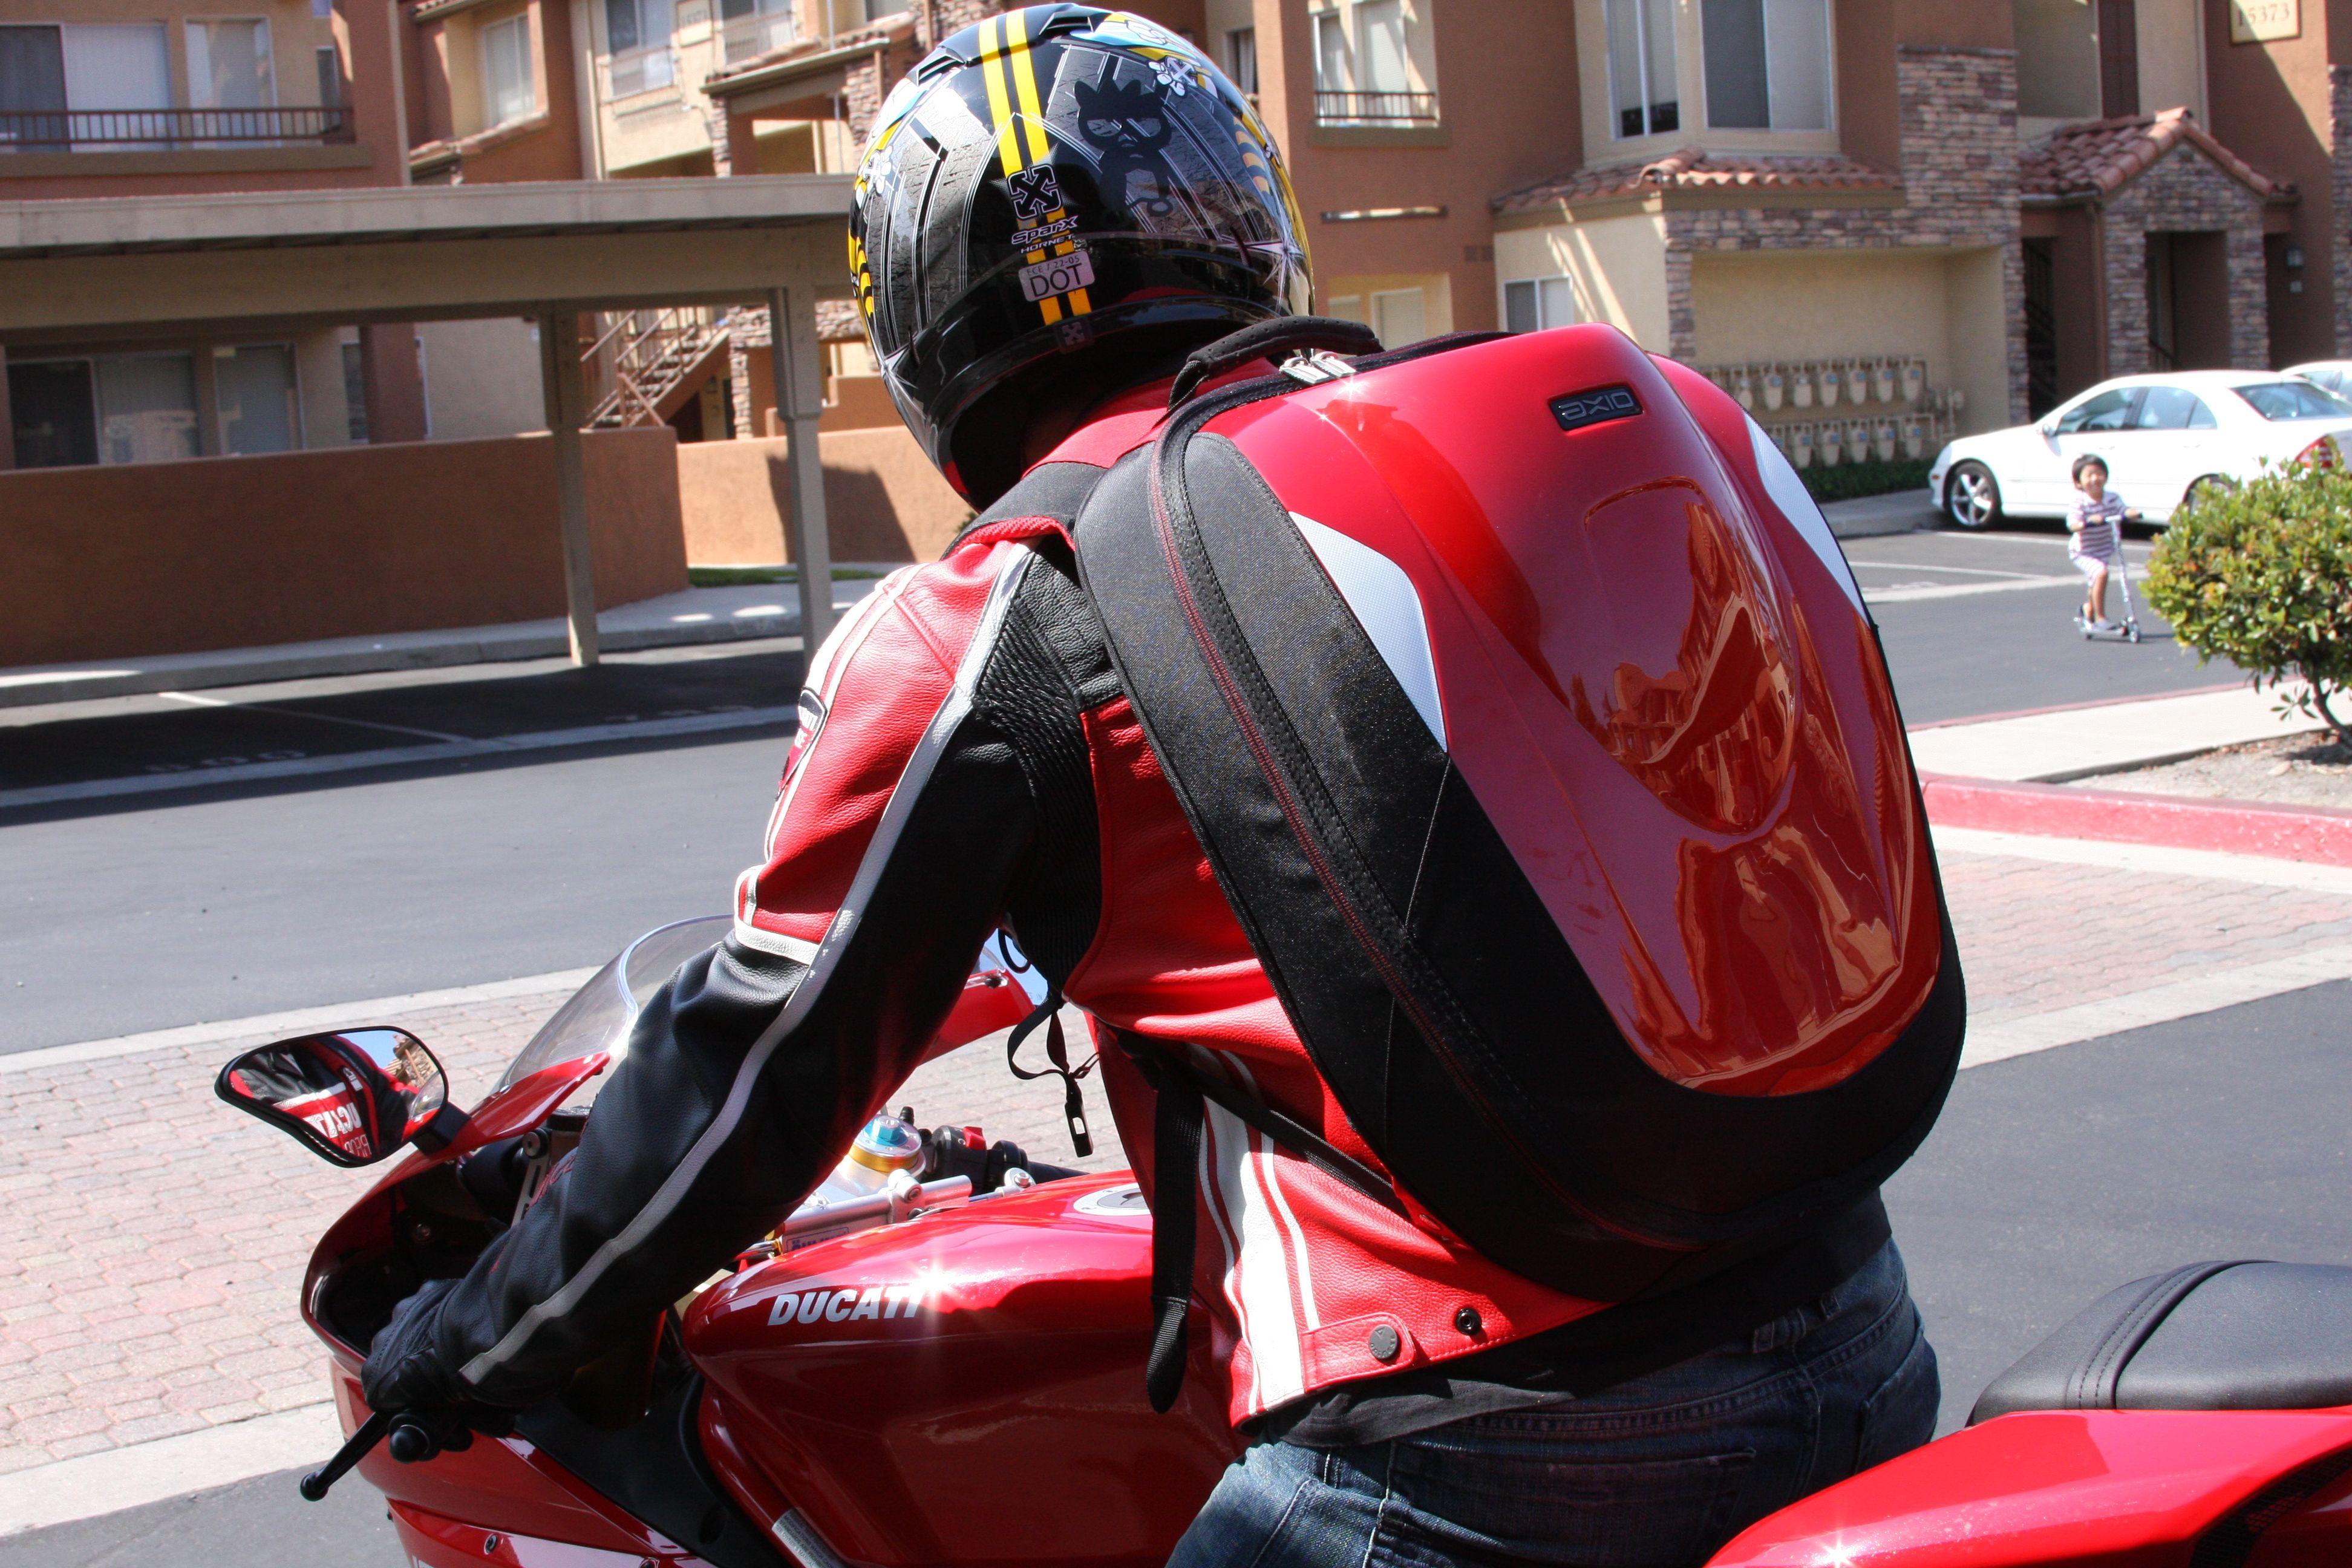 Best Hardshell And Hardcase Backpacks Motorcycle Luggage Backpacks Motorcycle Gear